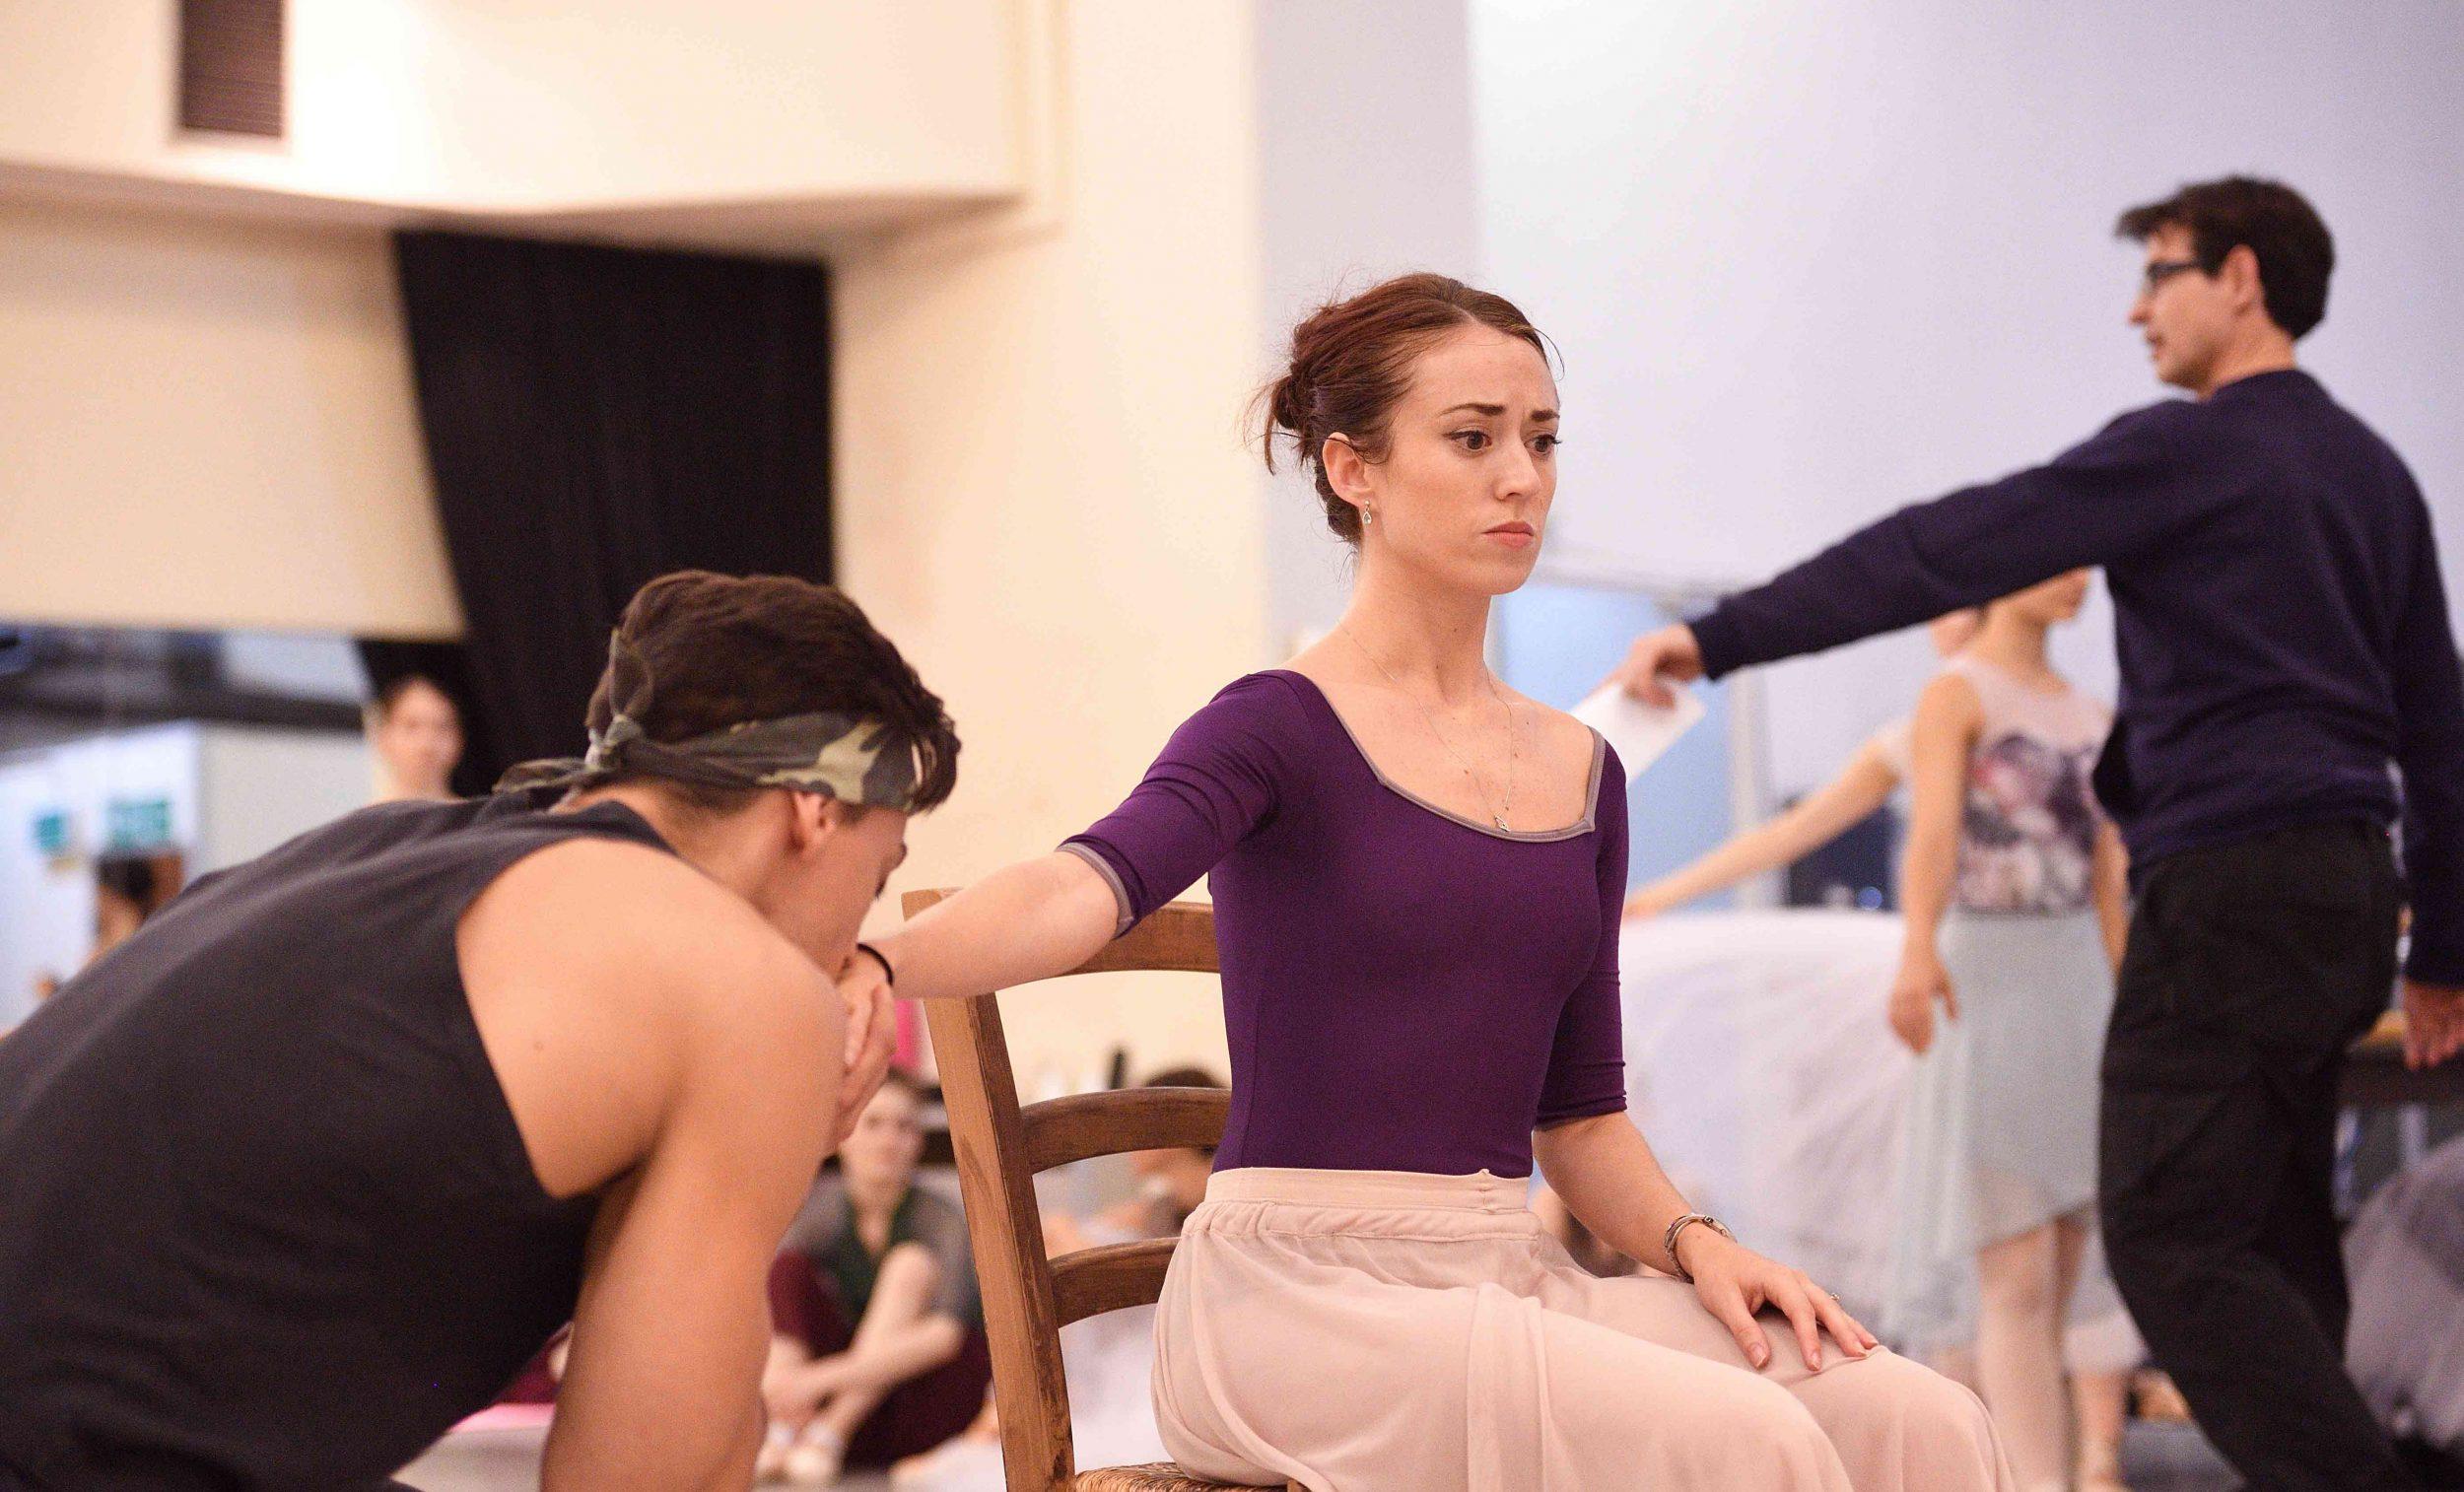 Anjuli-Hudson-rehearsing-La-Sylphide-©-Laurent-Liotardo